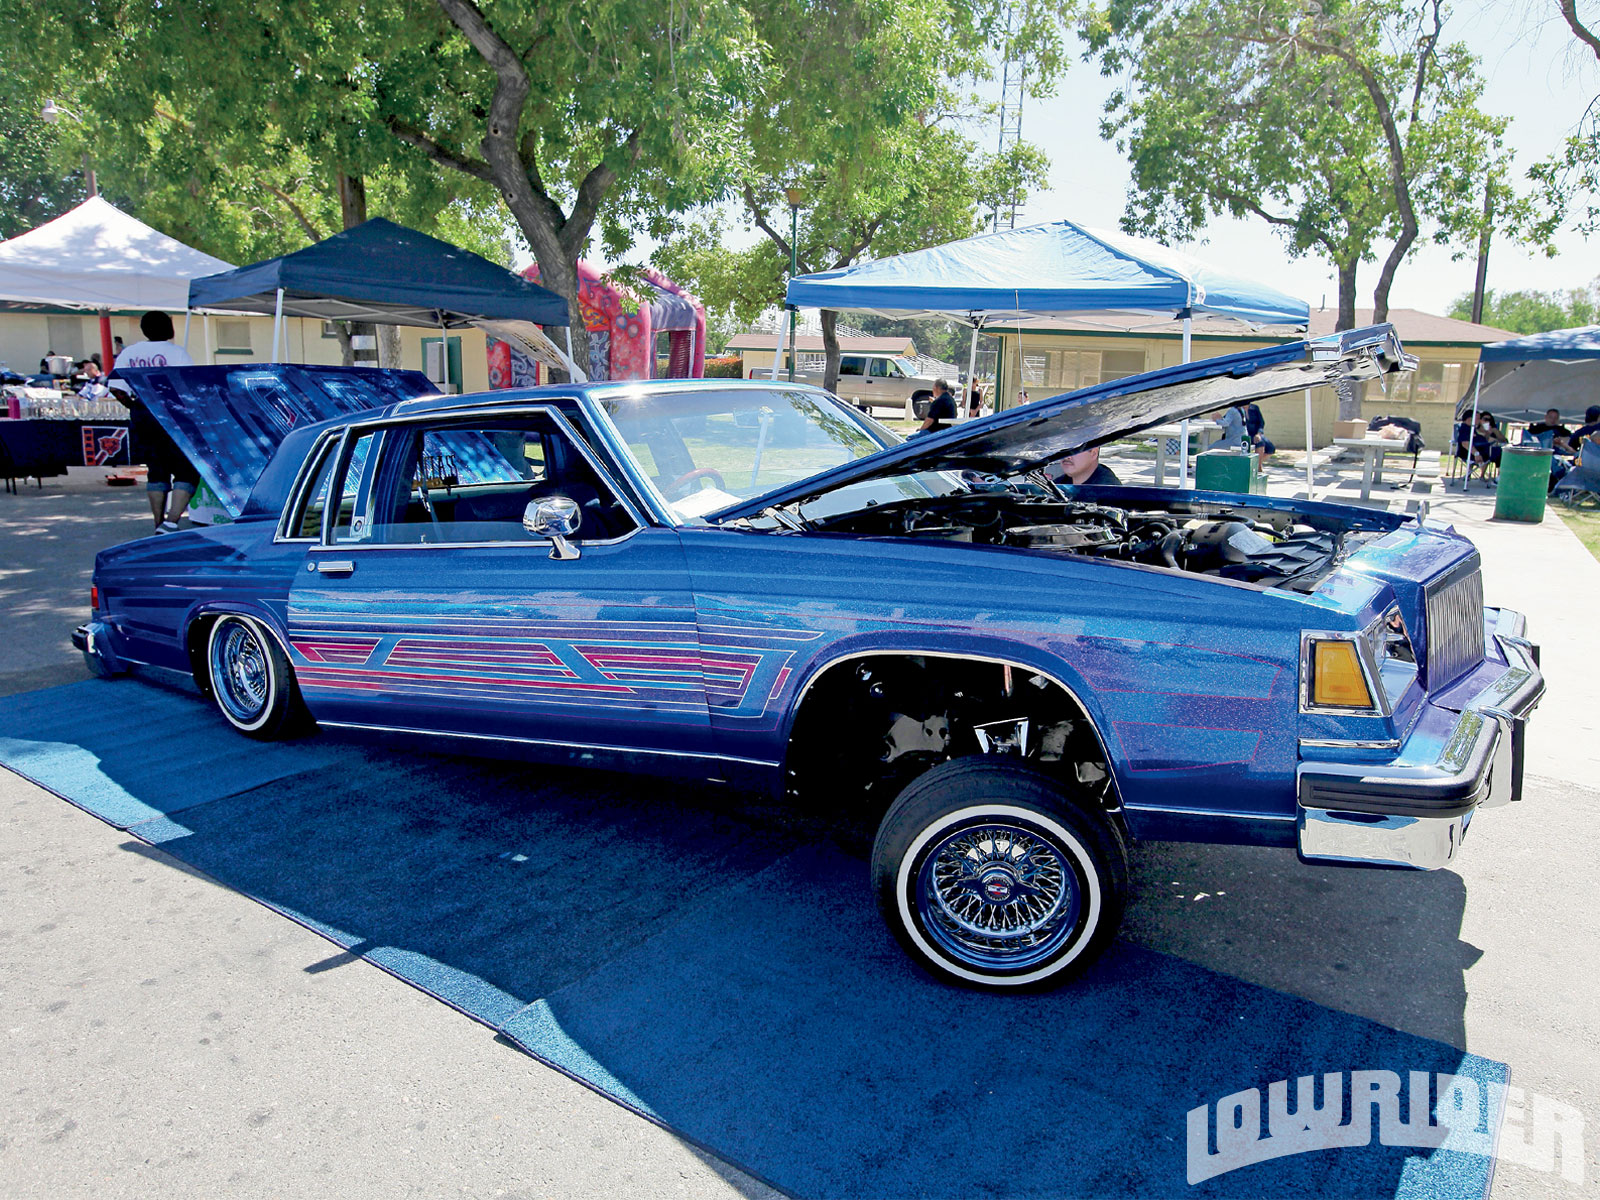 Nd Annual Majestics Of Delano Car Show Lowrider Magazine - Lowrider car show los angeles 2018